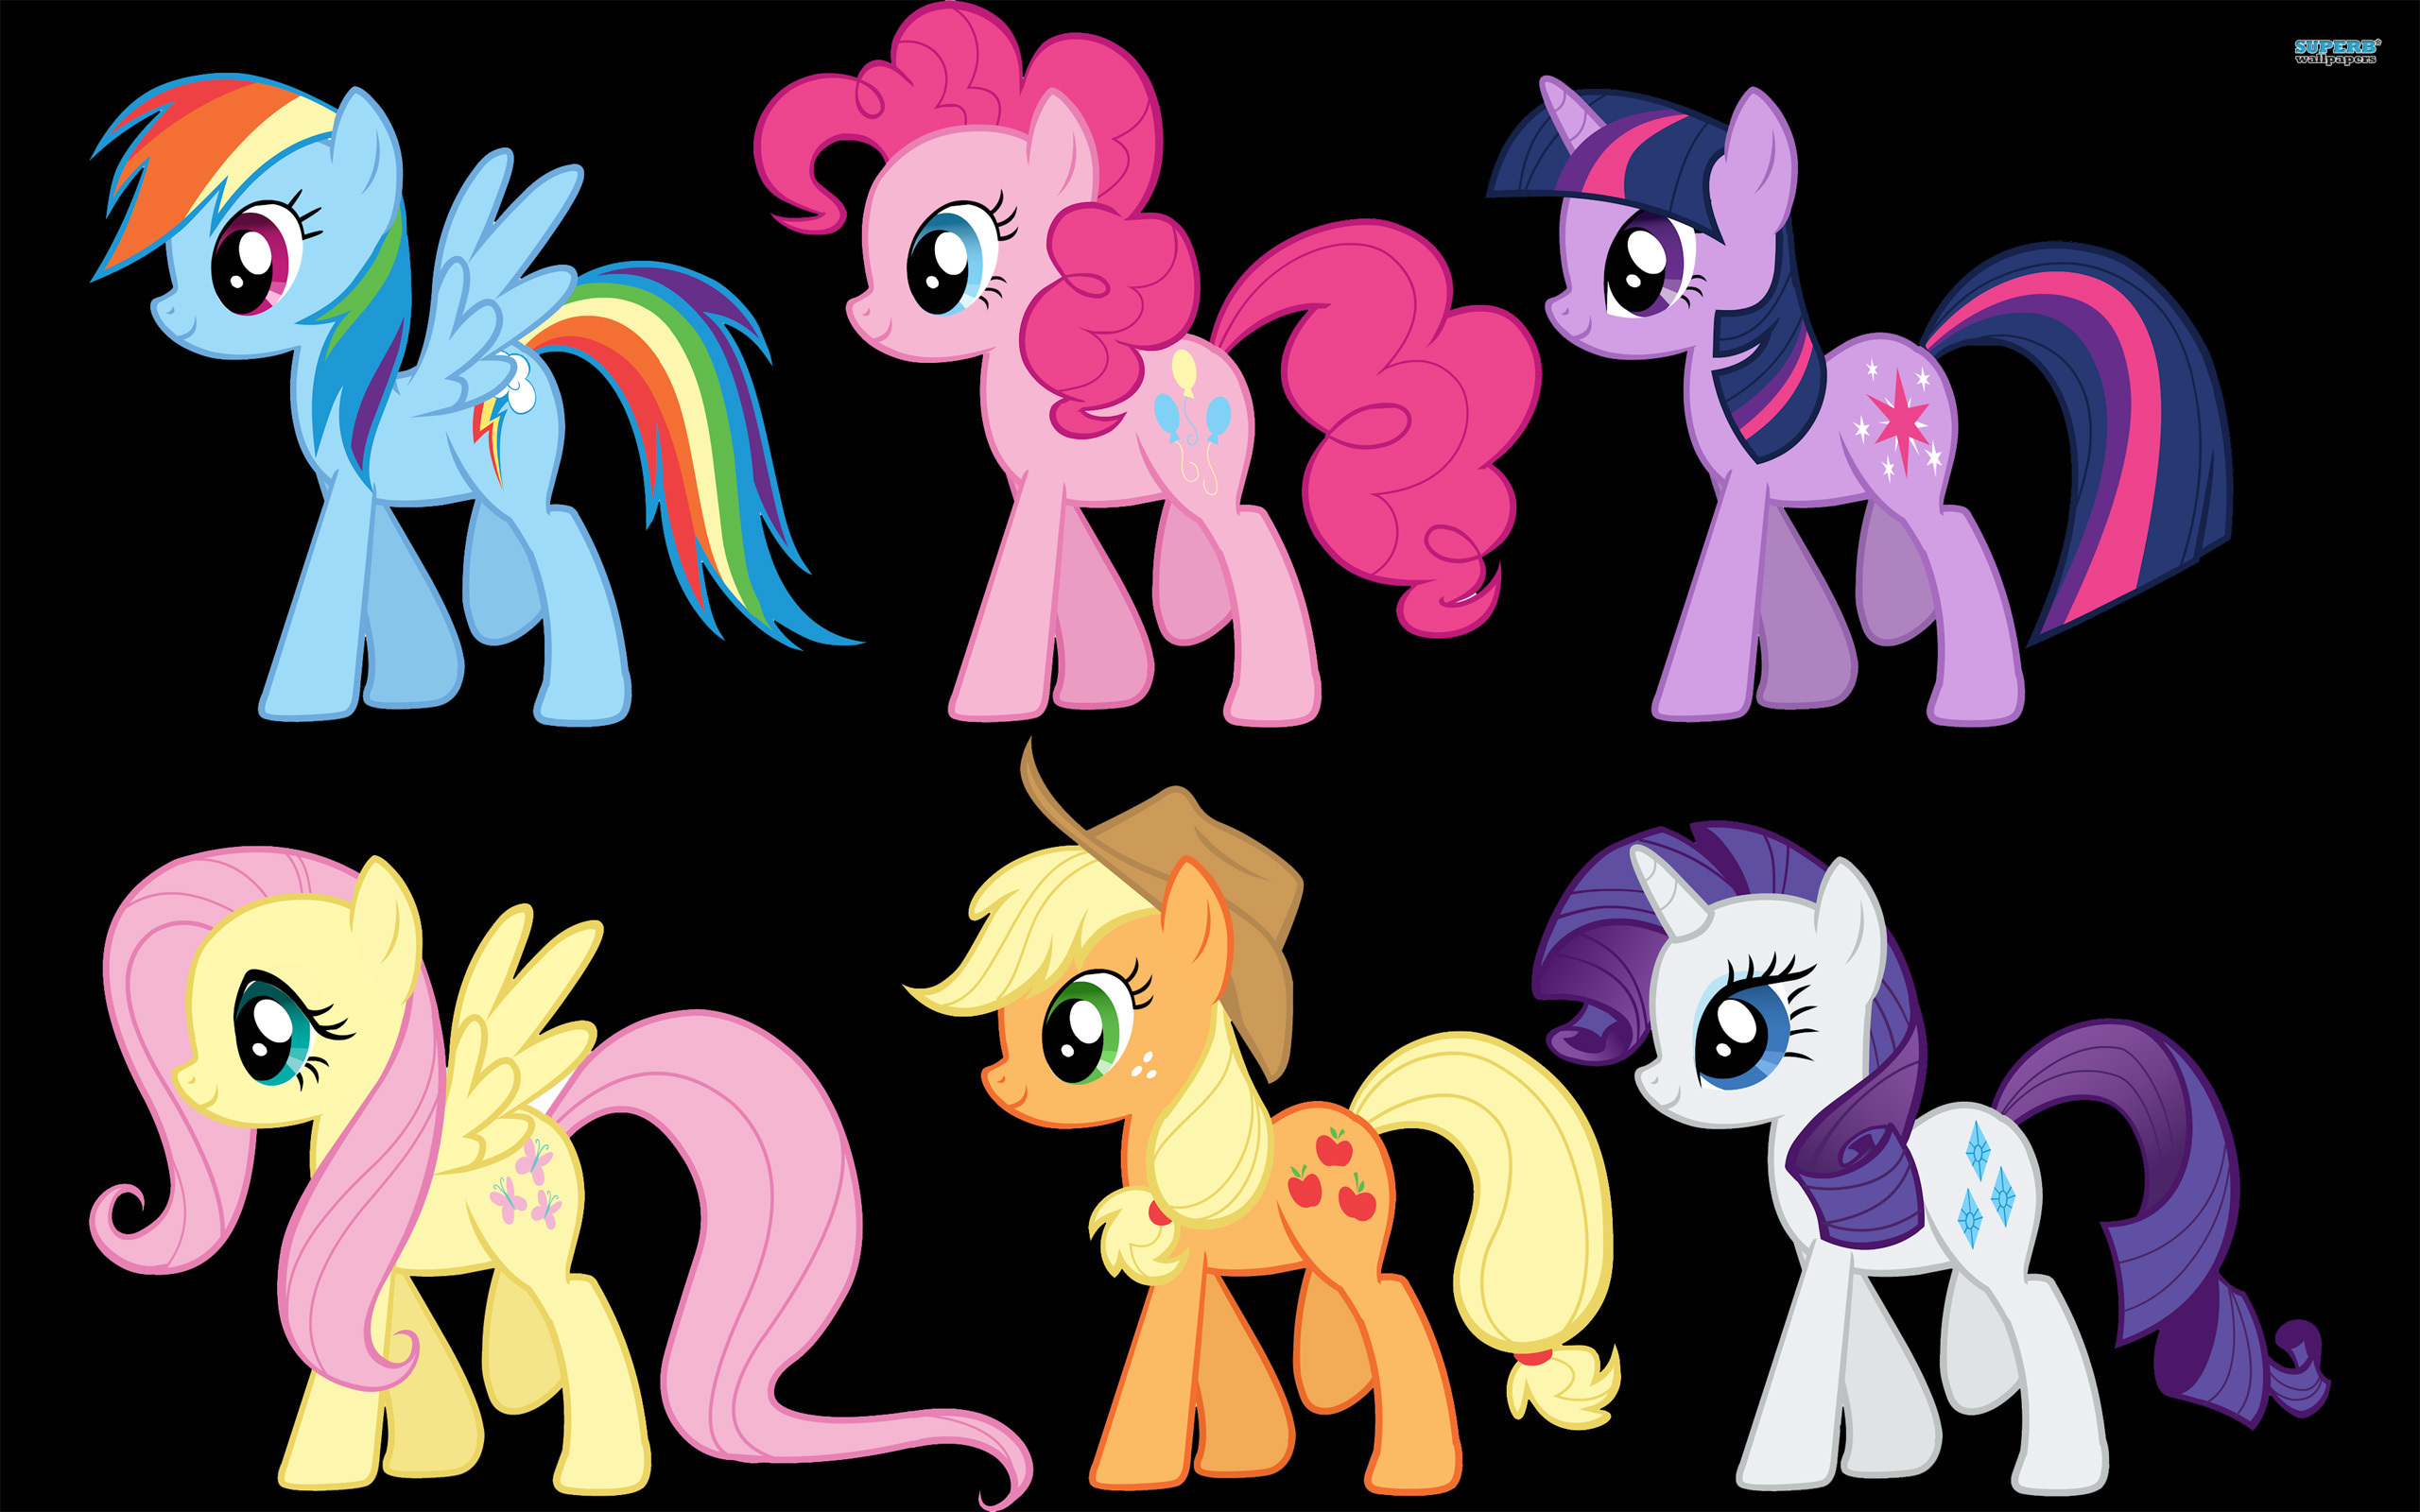 my-little-pony-friendship-is-magic-my-little-pony-friendship-is-magic-32105499-2560-1600